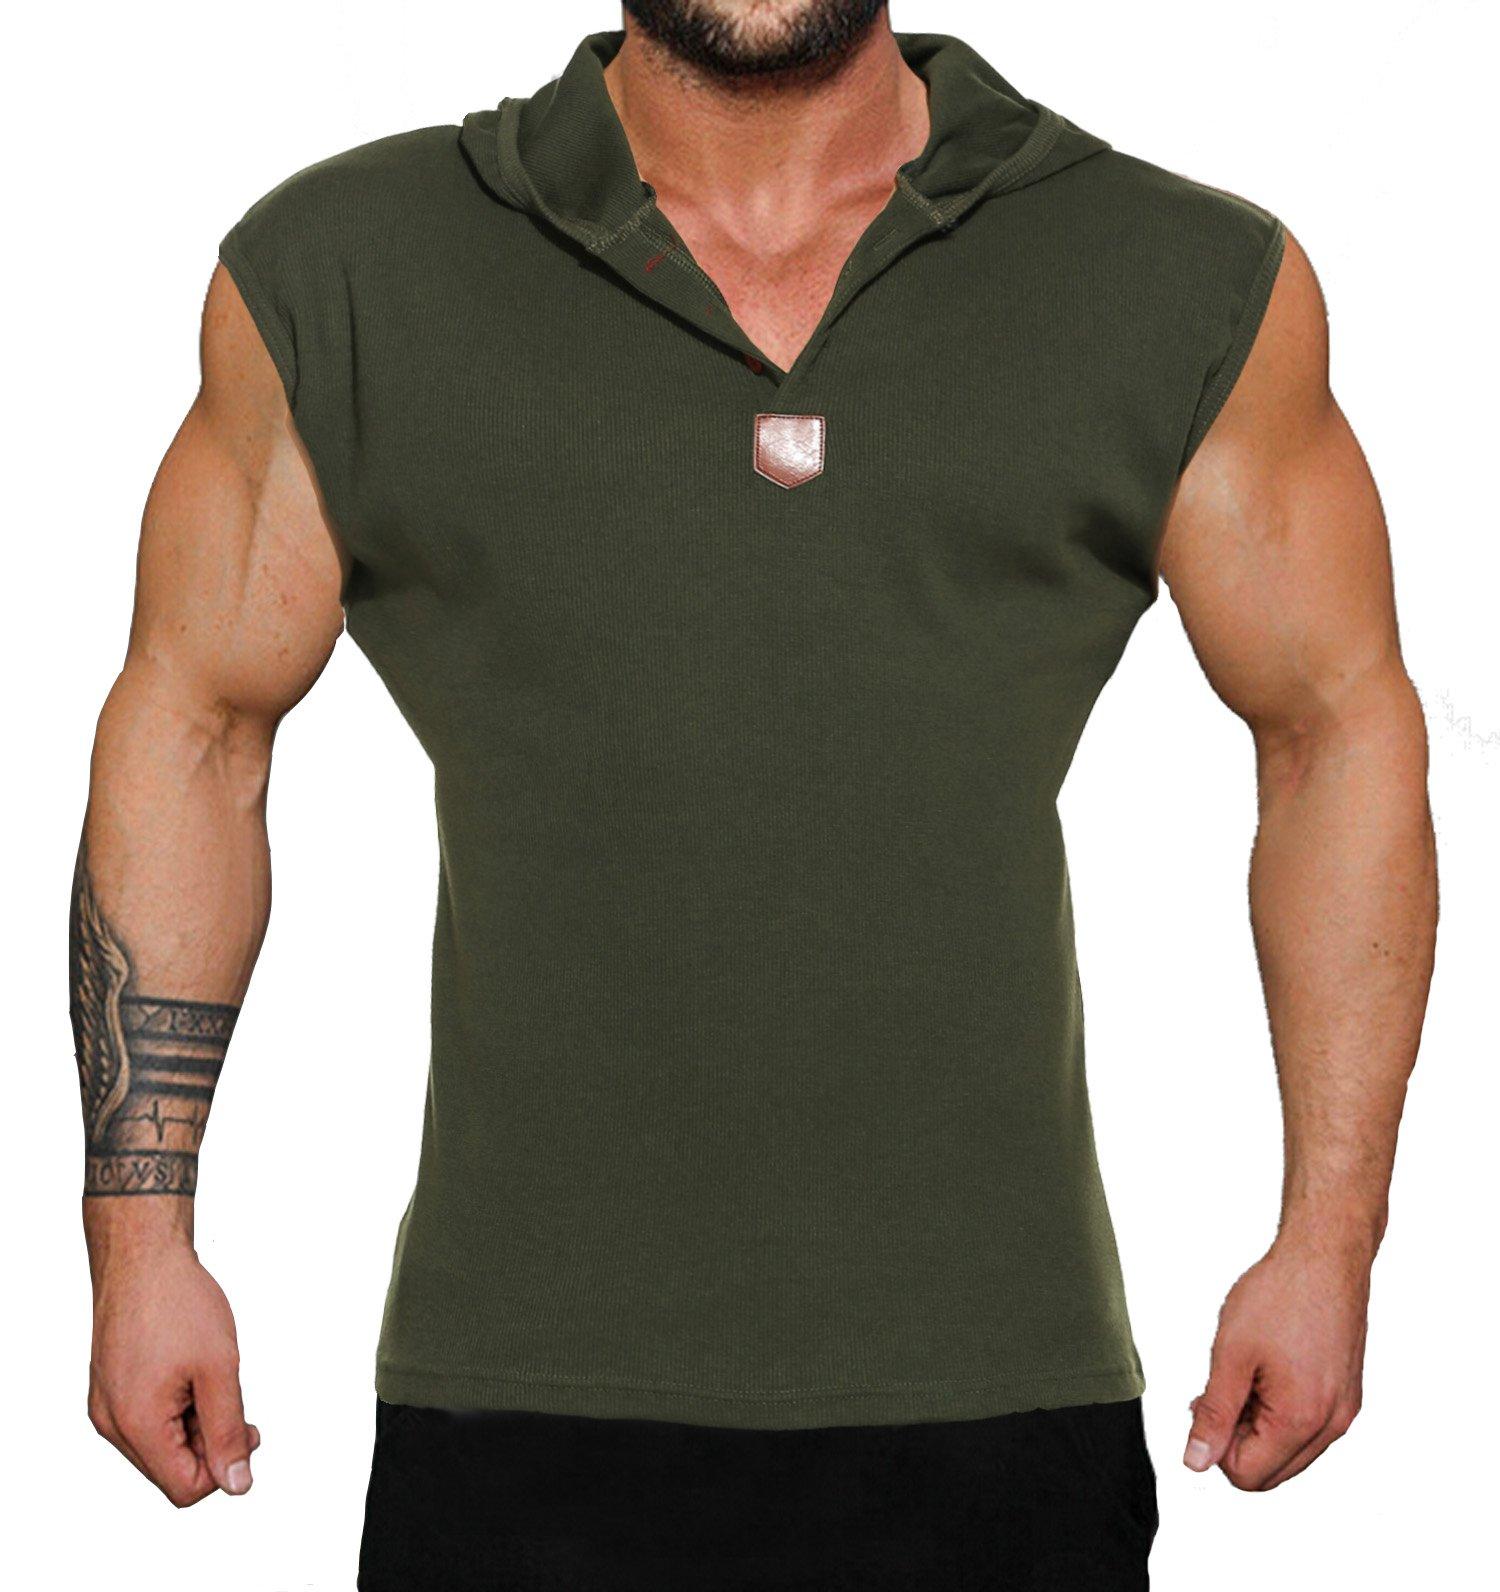 Coofandy Men's Casual Hooded Sleeveless Tank Tops, Green, Medium